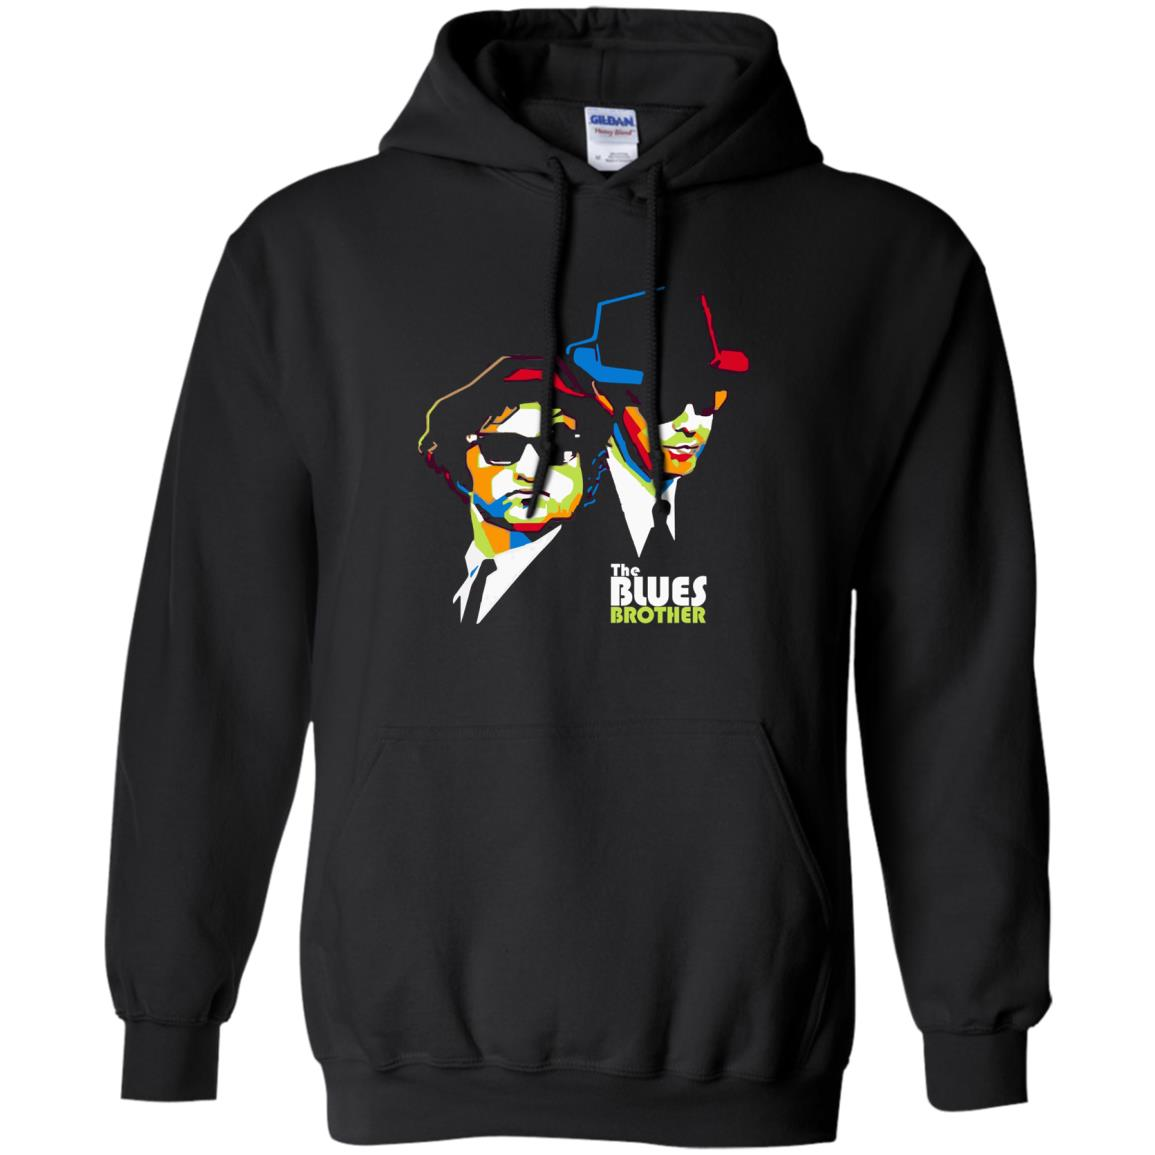 image 643 - The Blues Brother Shirt, Sweatshirt, Hoodie